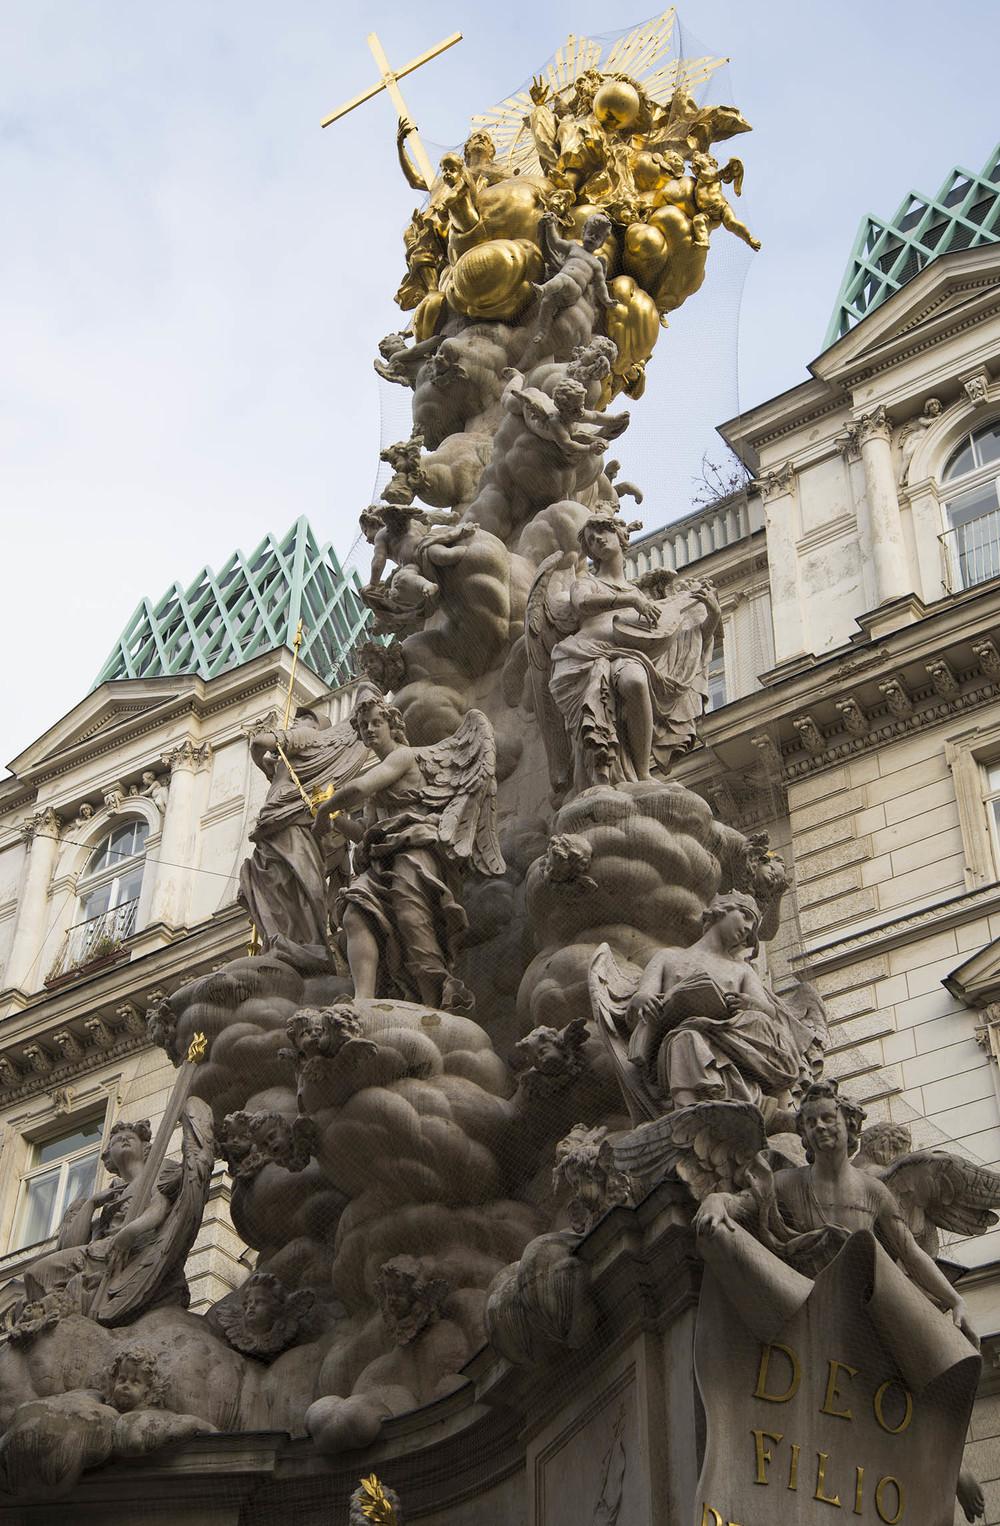 Pestsäule, Ludovico Bernacini & others, 1679 - 1693, Vienna